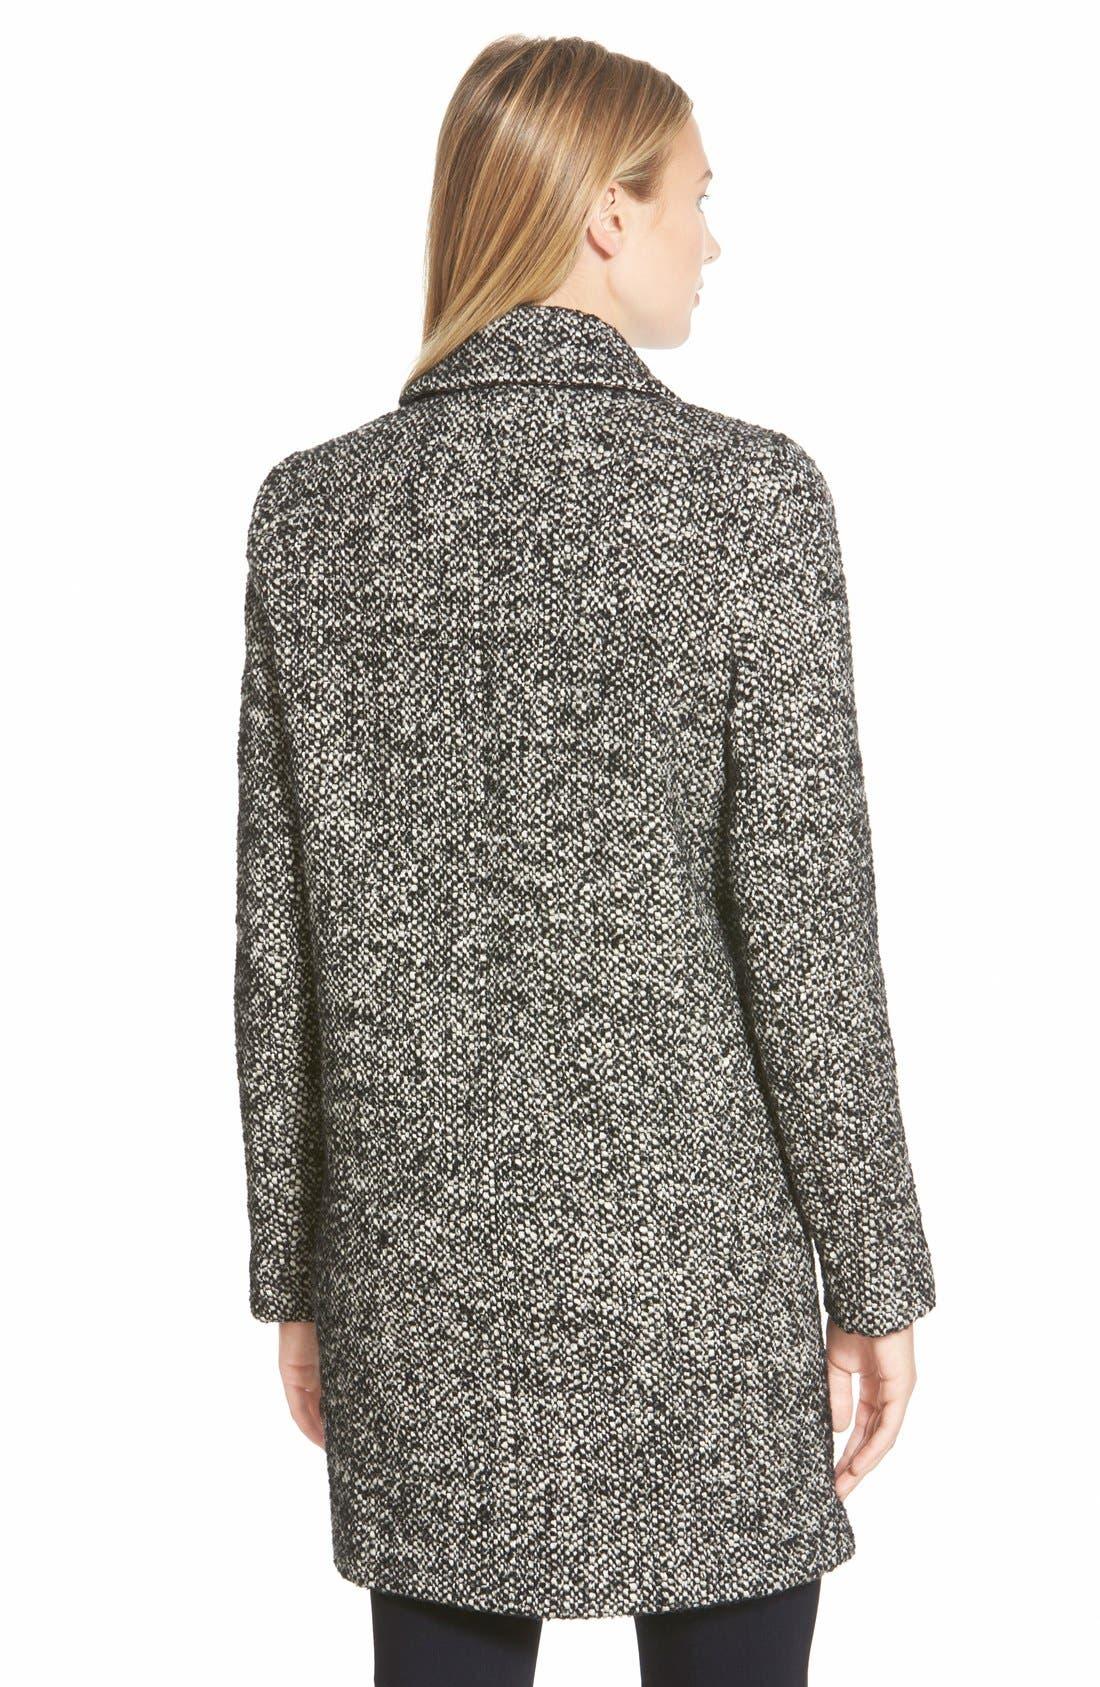 Tweed Walking Coat,                             Alternate thumbnail 4, color,                             081